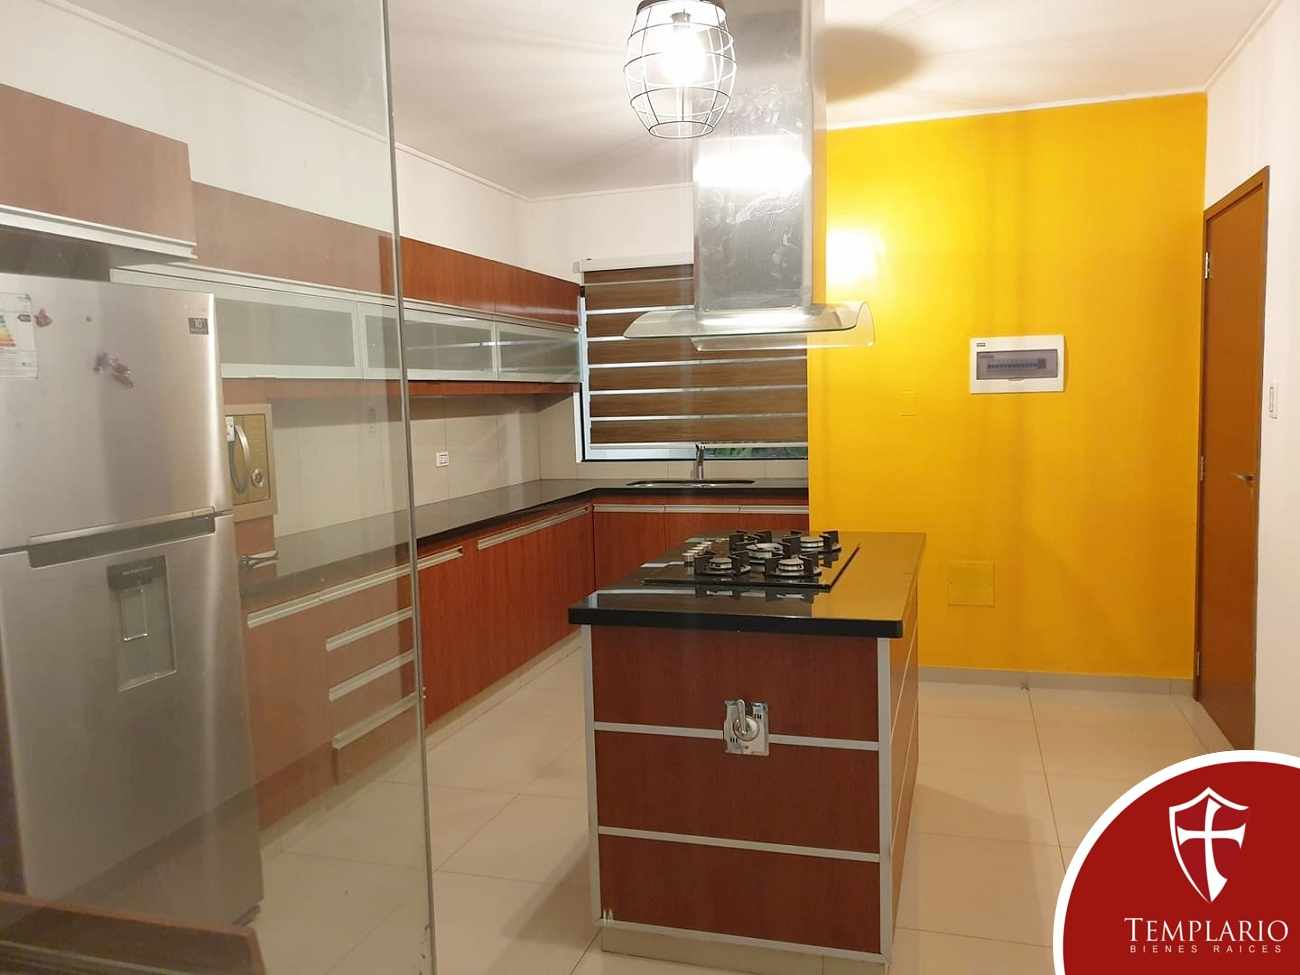 Casa en Venta Av. Beni 8vo Anillo - Zona Norte Foto 1